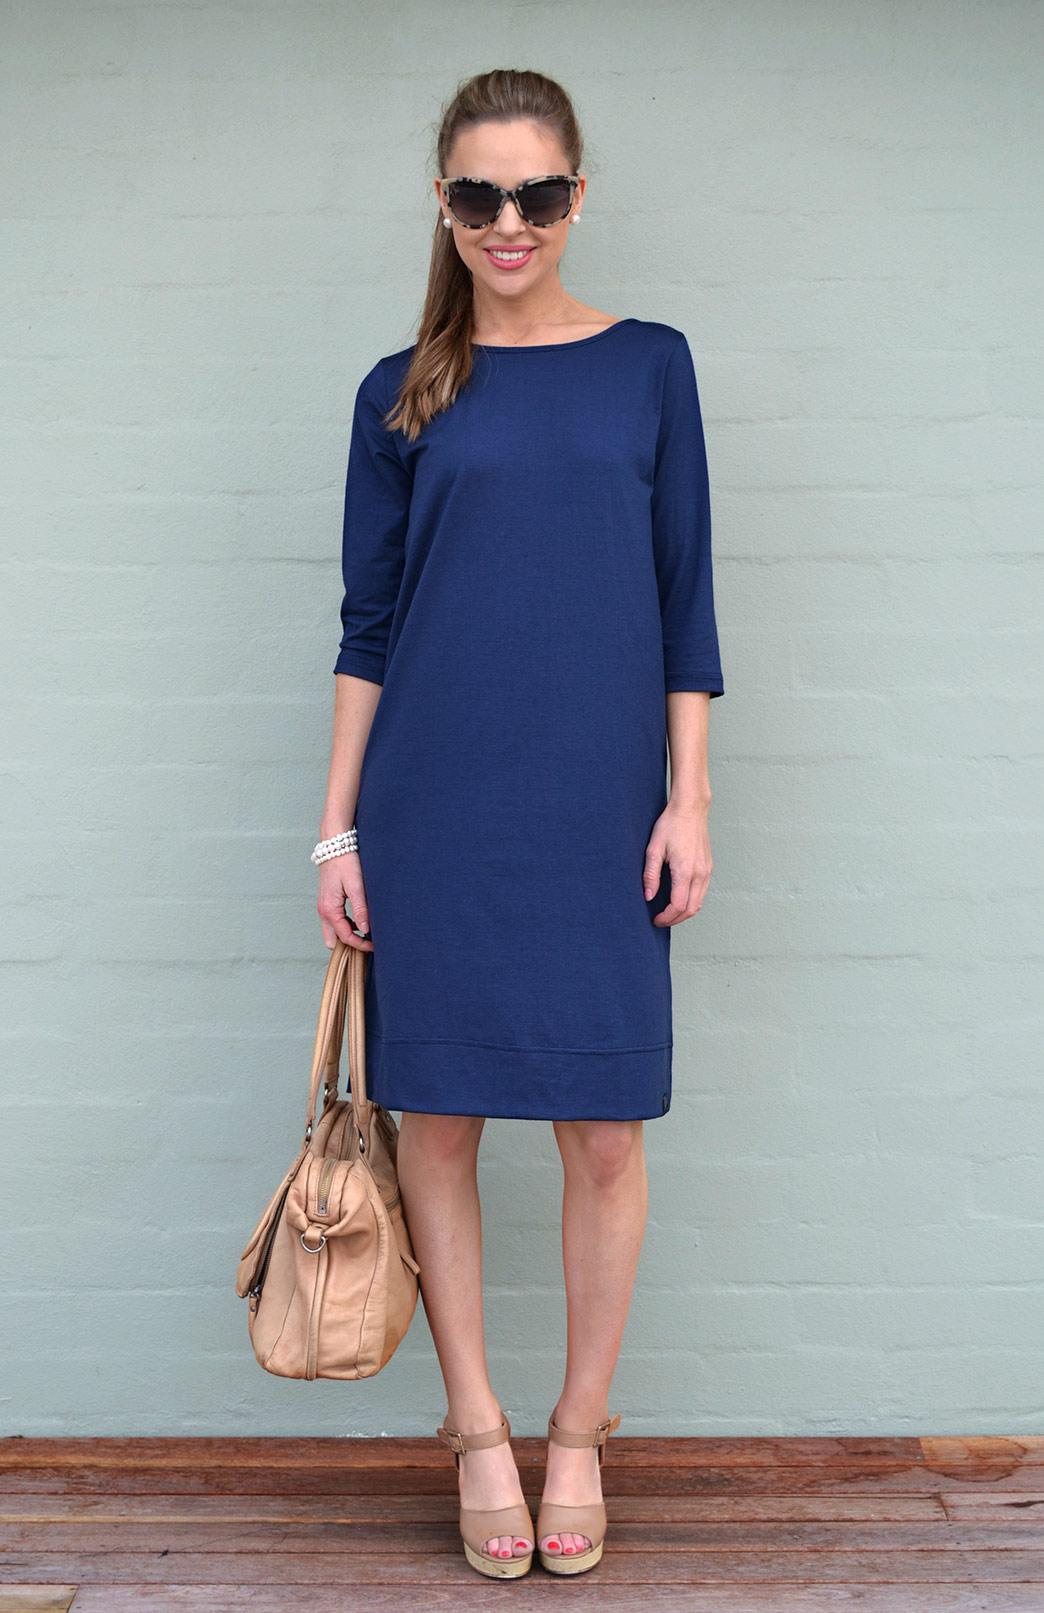 Indigo Audrey Dress- Shop the colour range  here